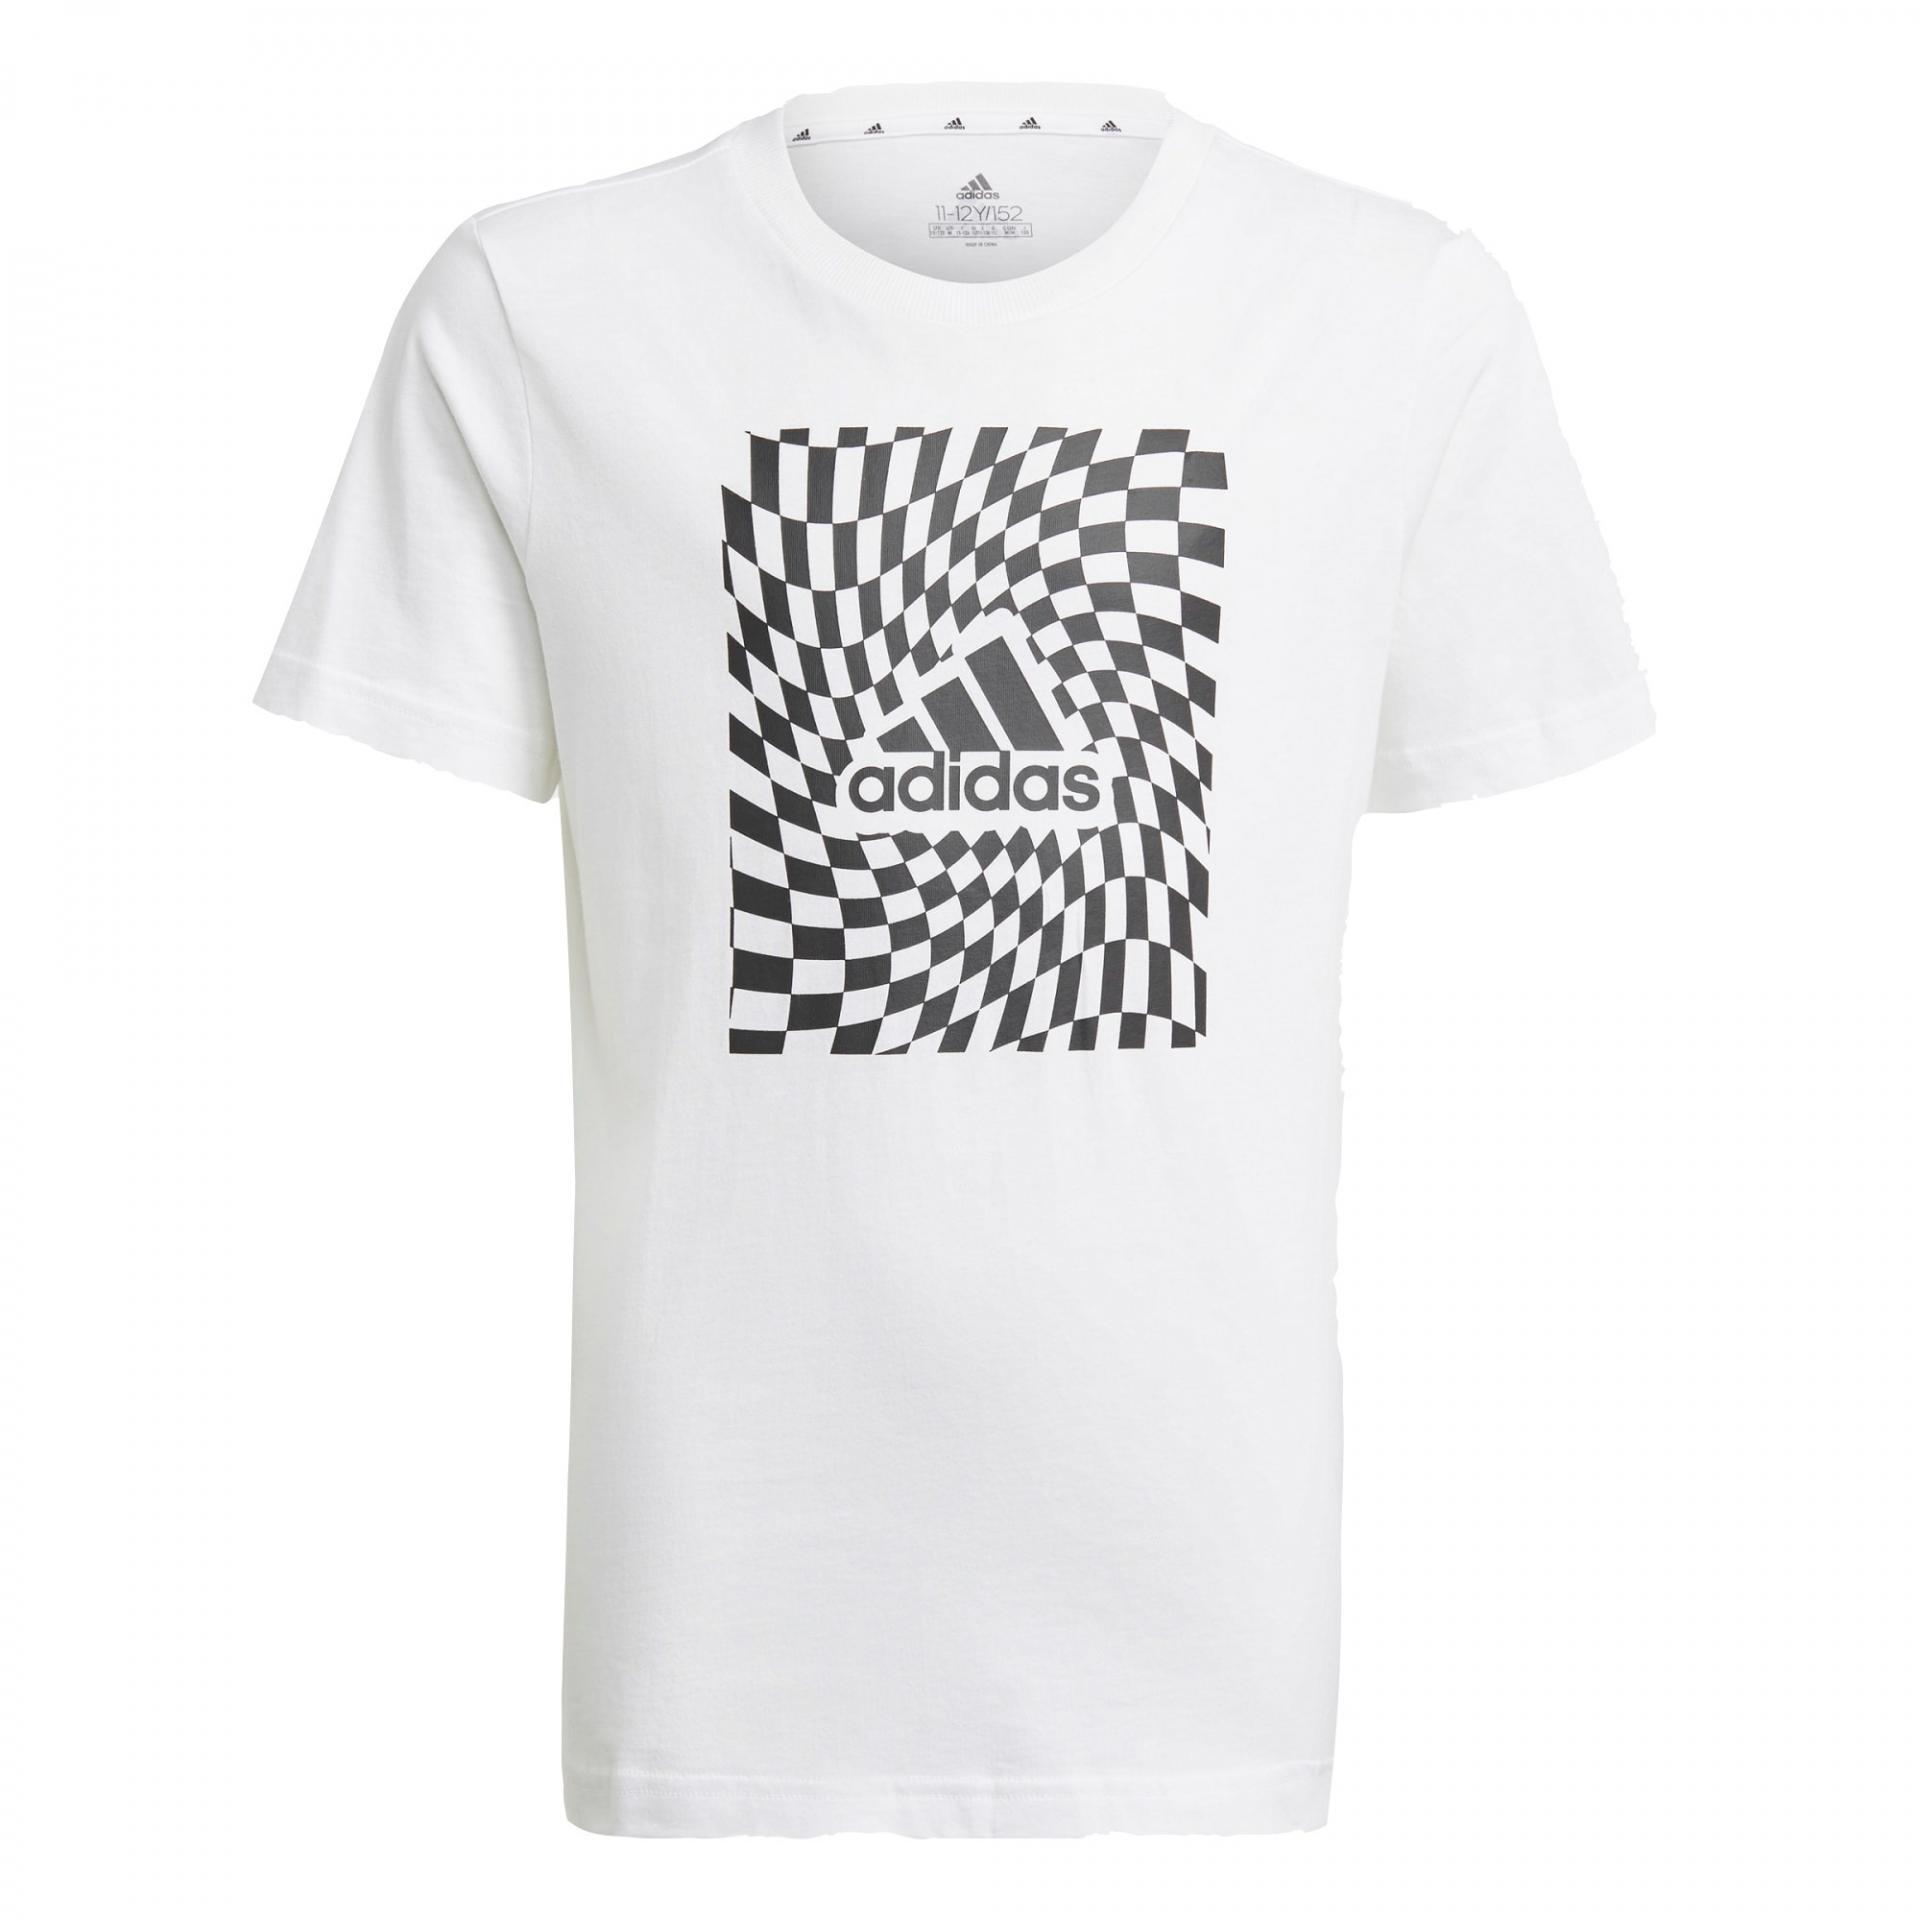 Camiseta niños ADIDAS GRAPHIC